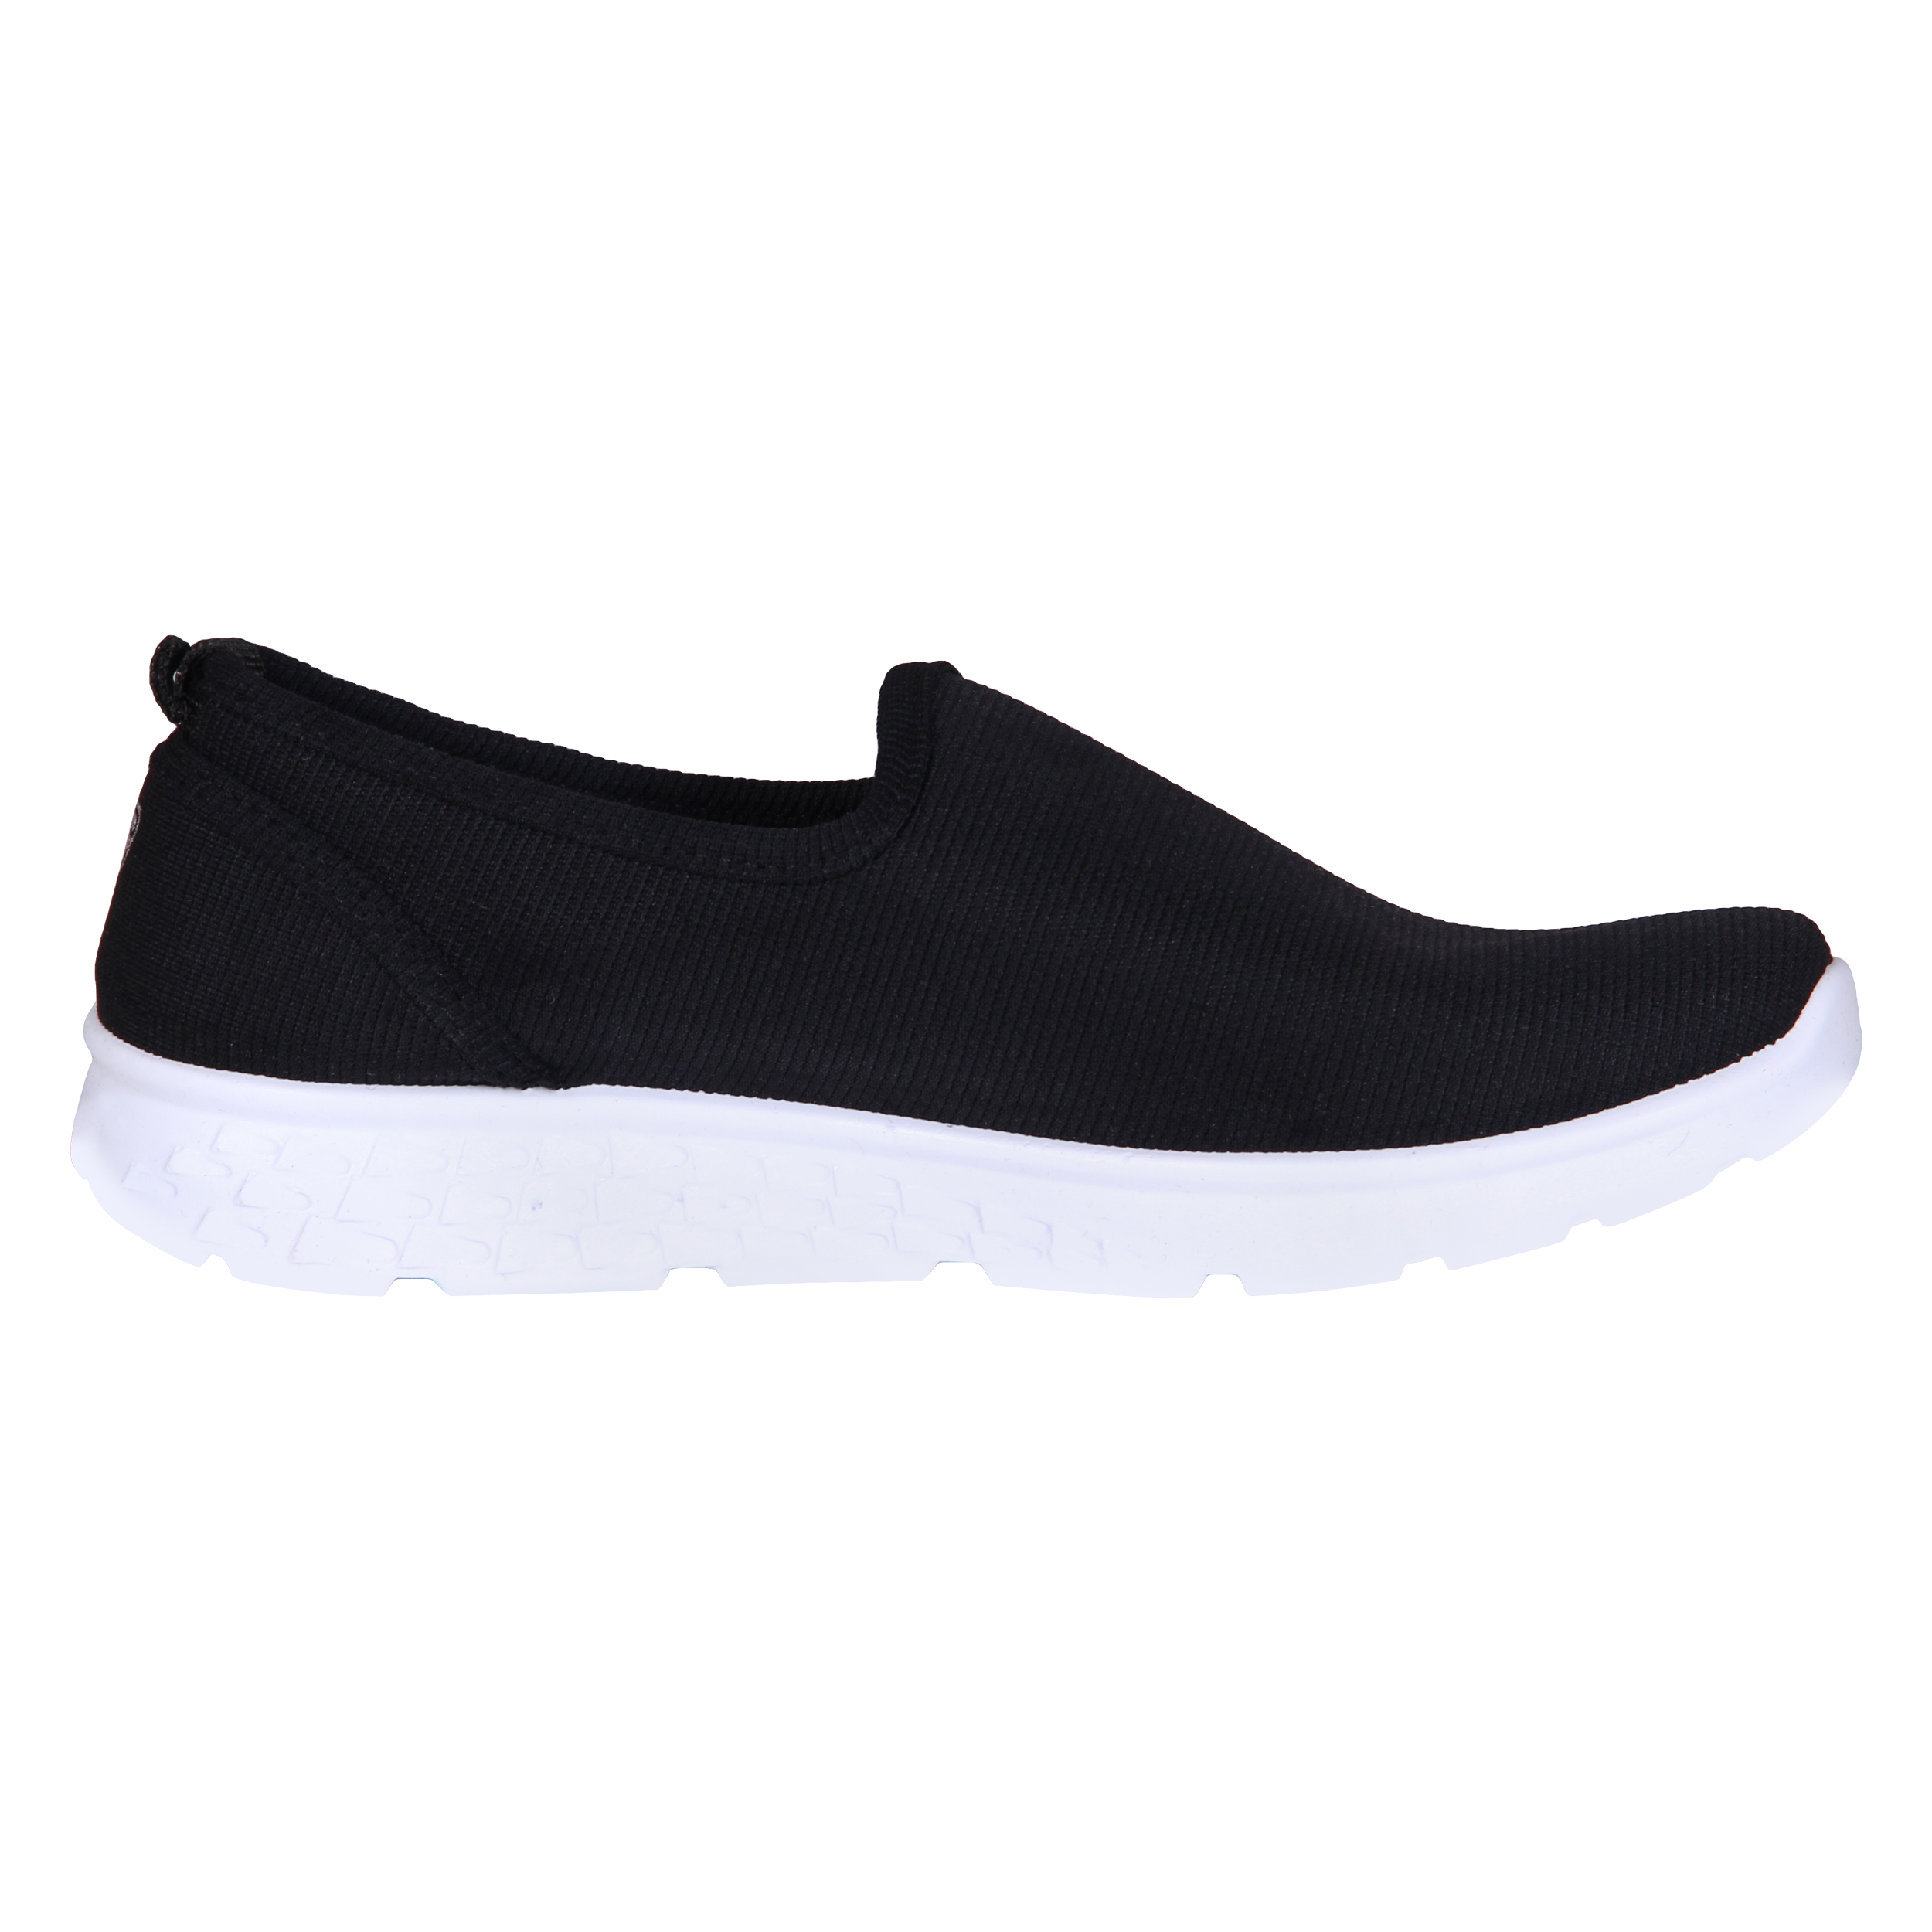 خرید                        کفش اسپورت مردانه کد 69-40006